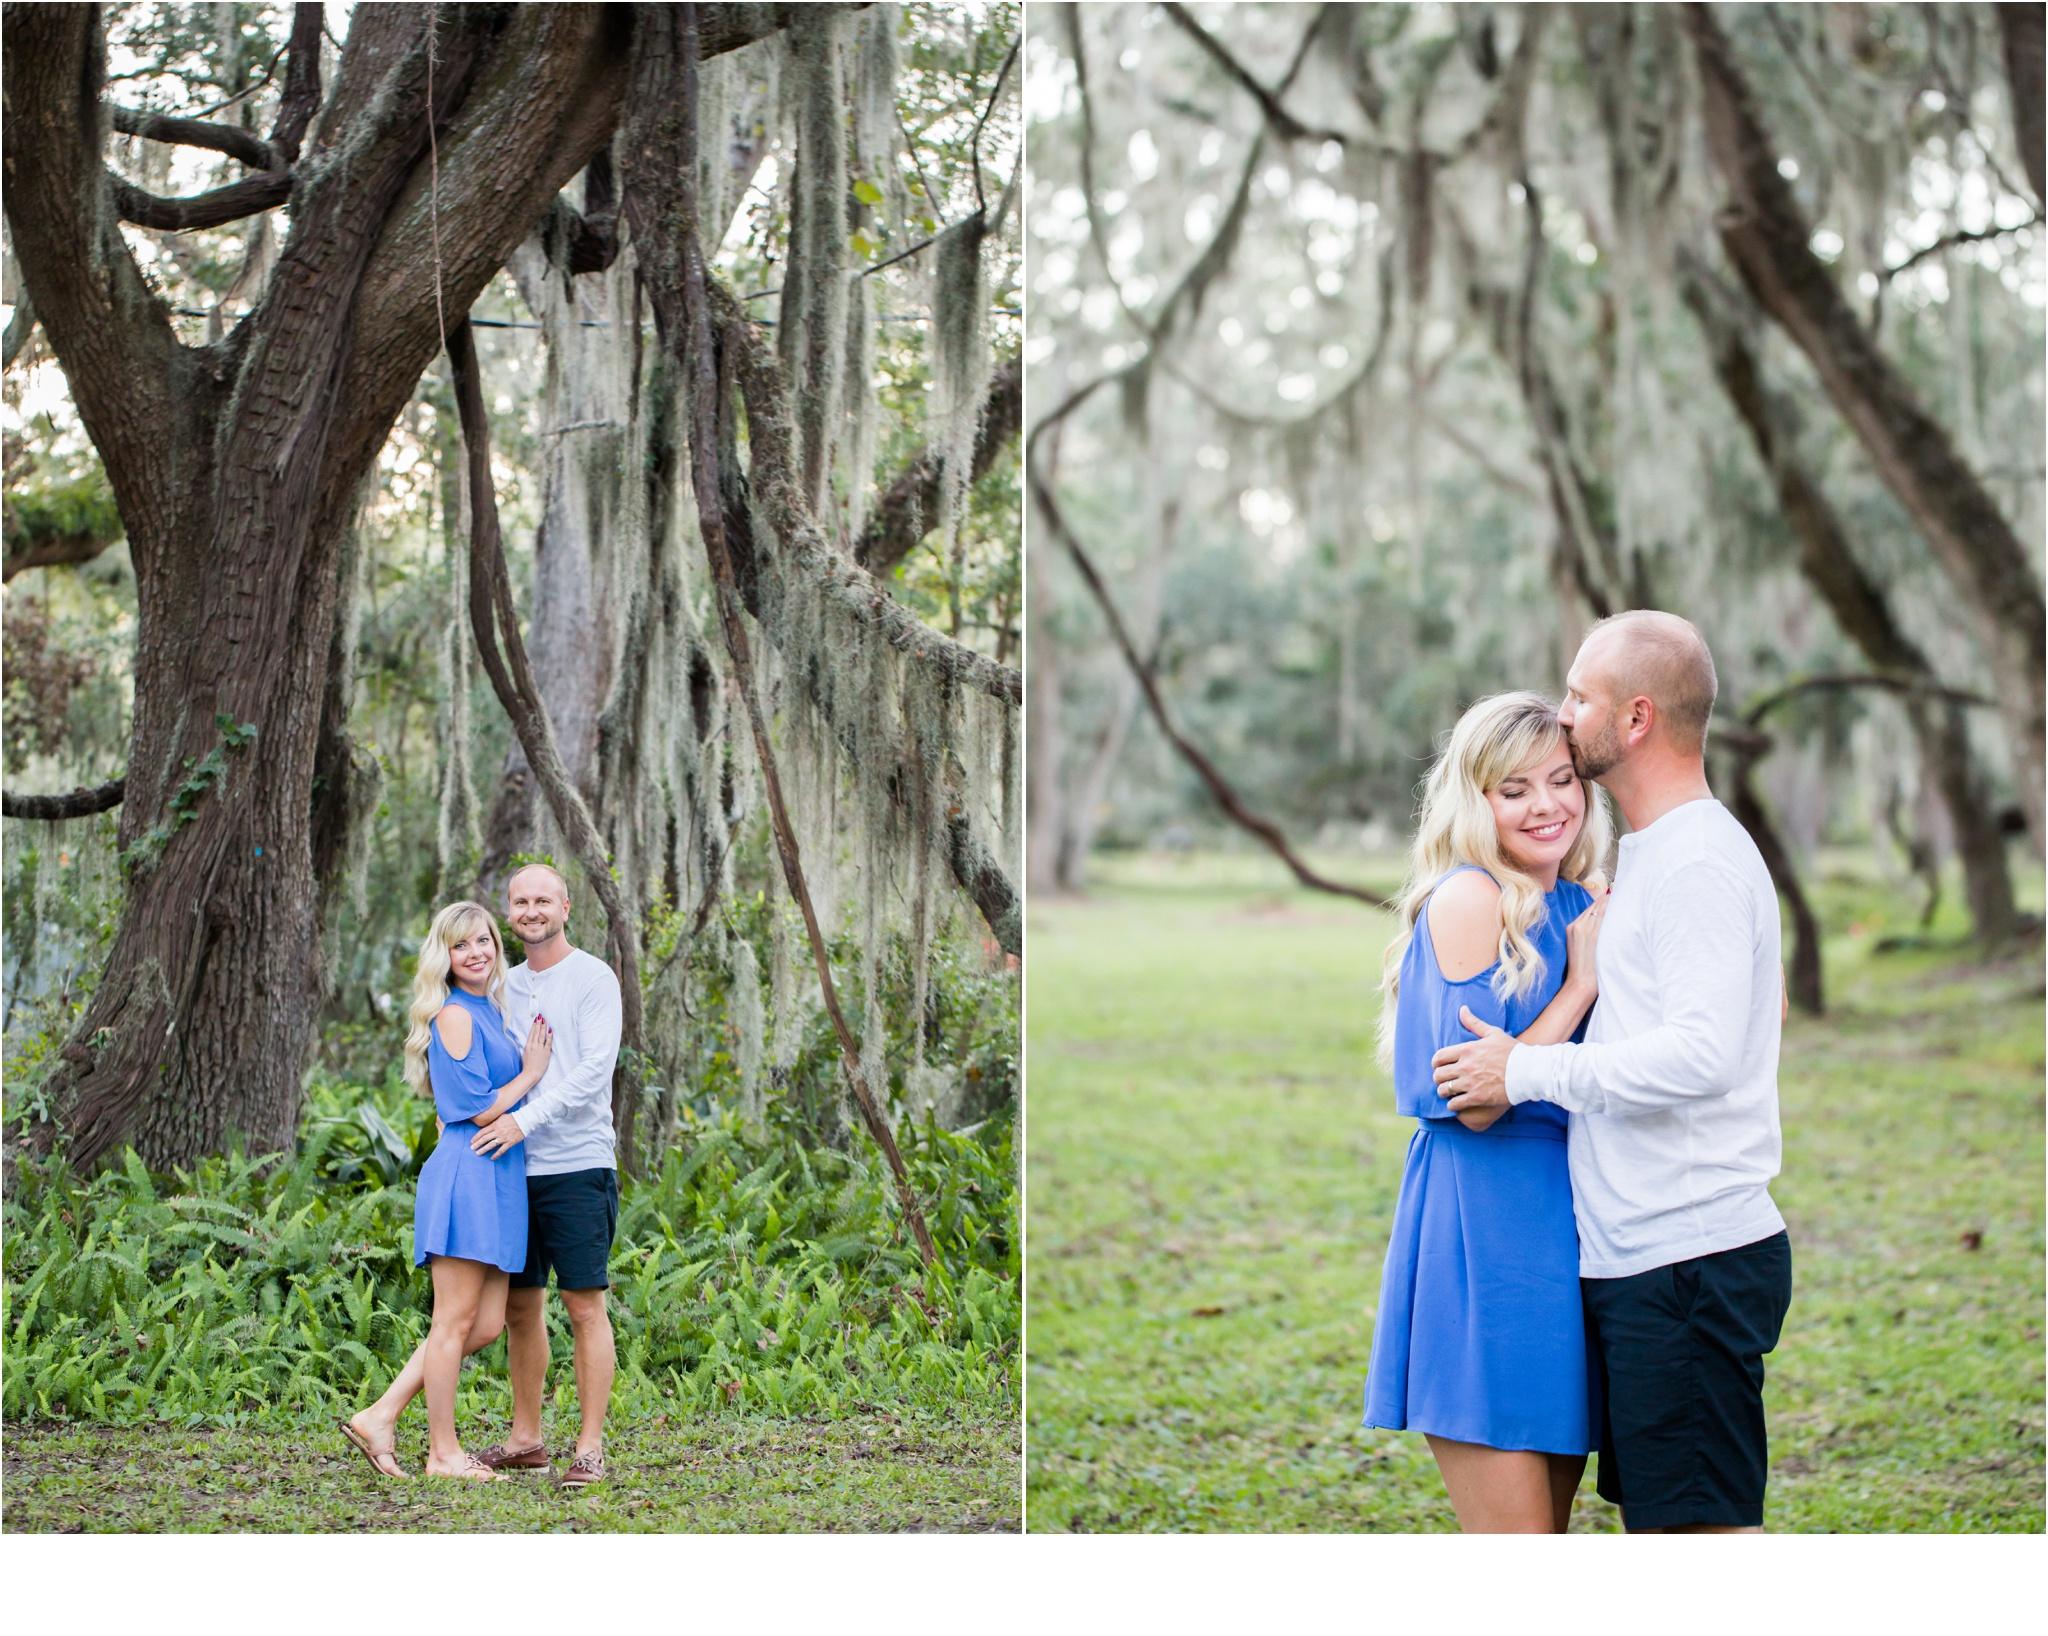 Rainey_Gregg_Photography_St._Simons_Island_Georgia_California_Wedding_Portrait_Photography_0263.jpg